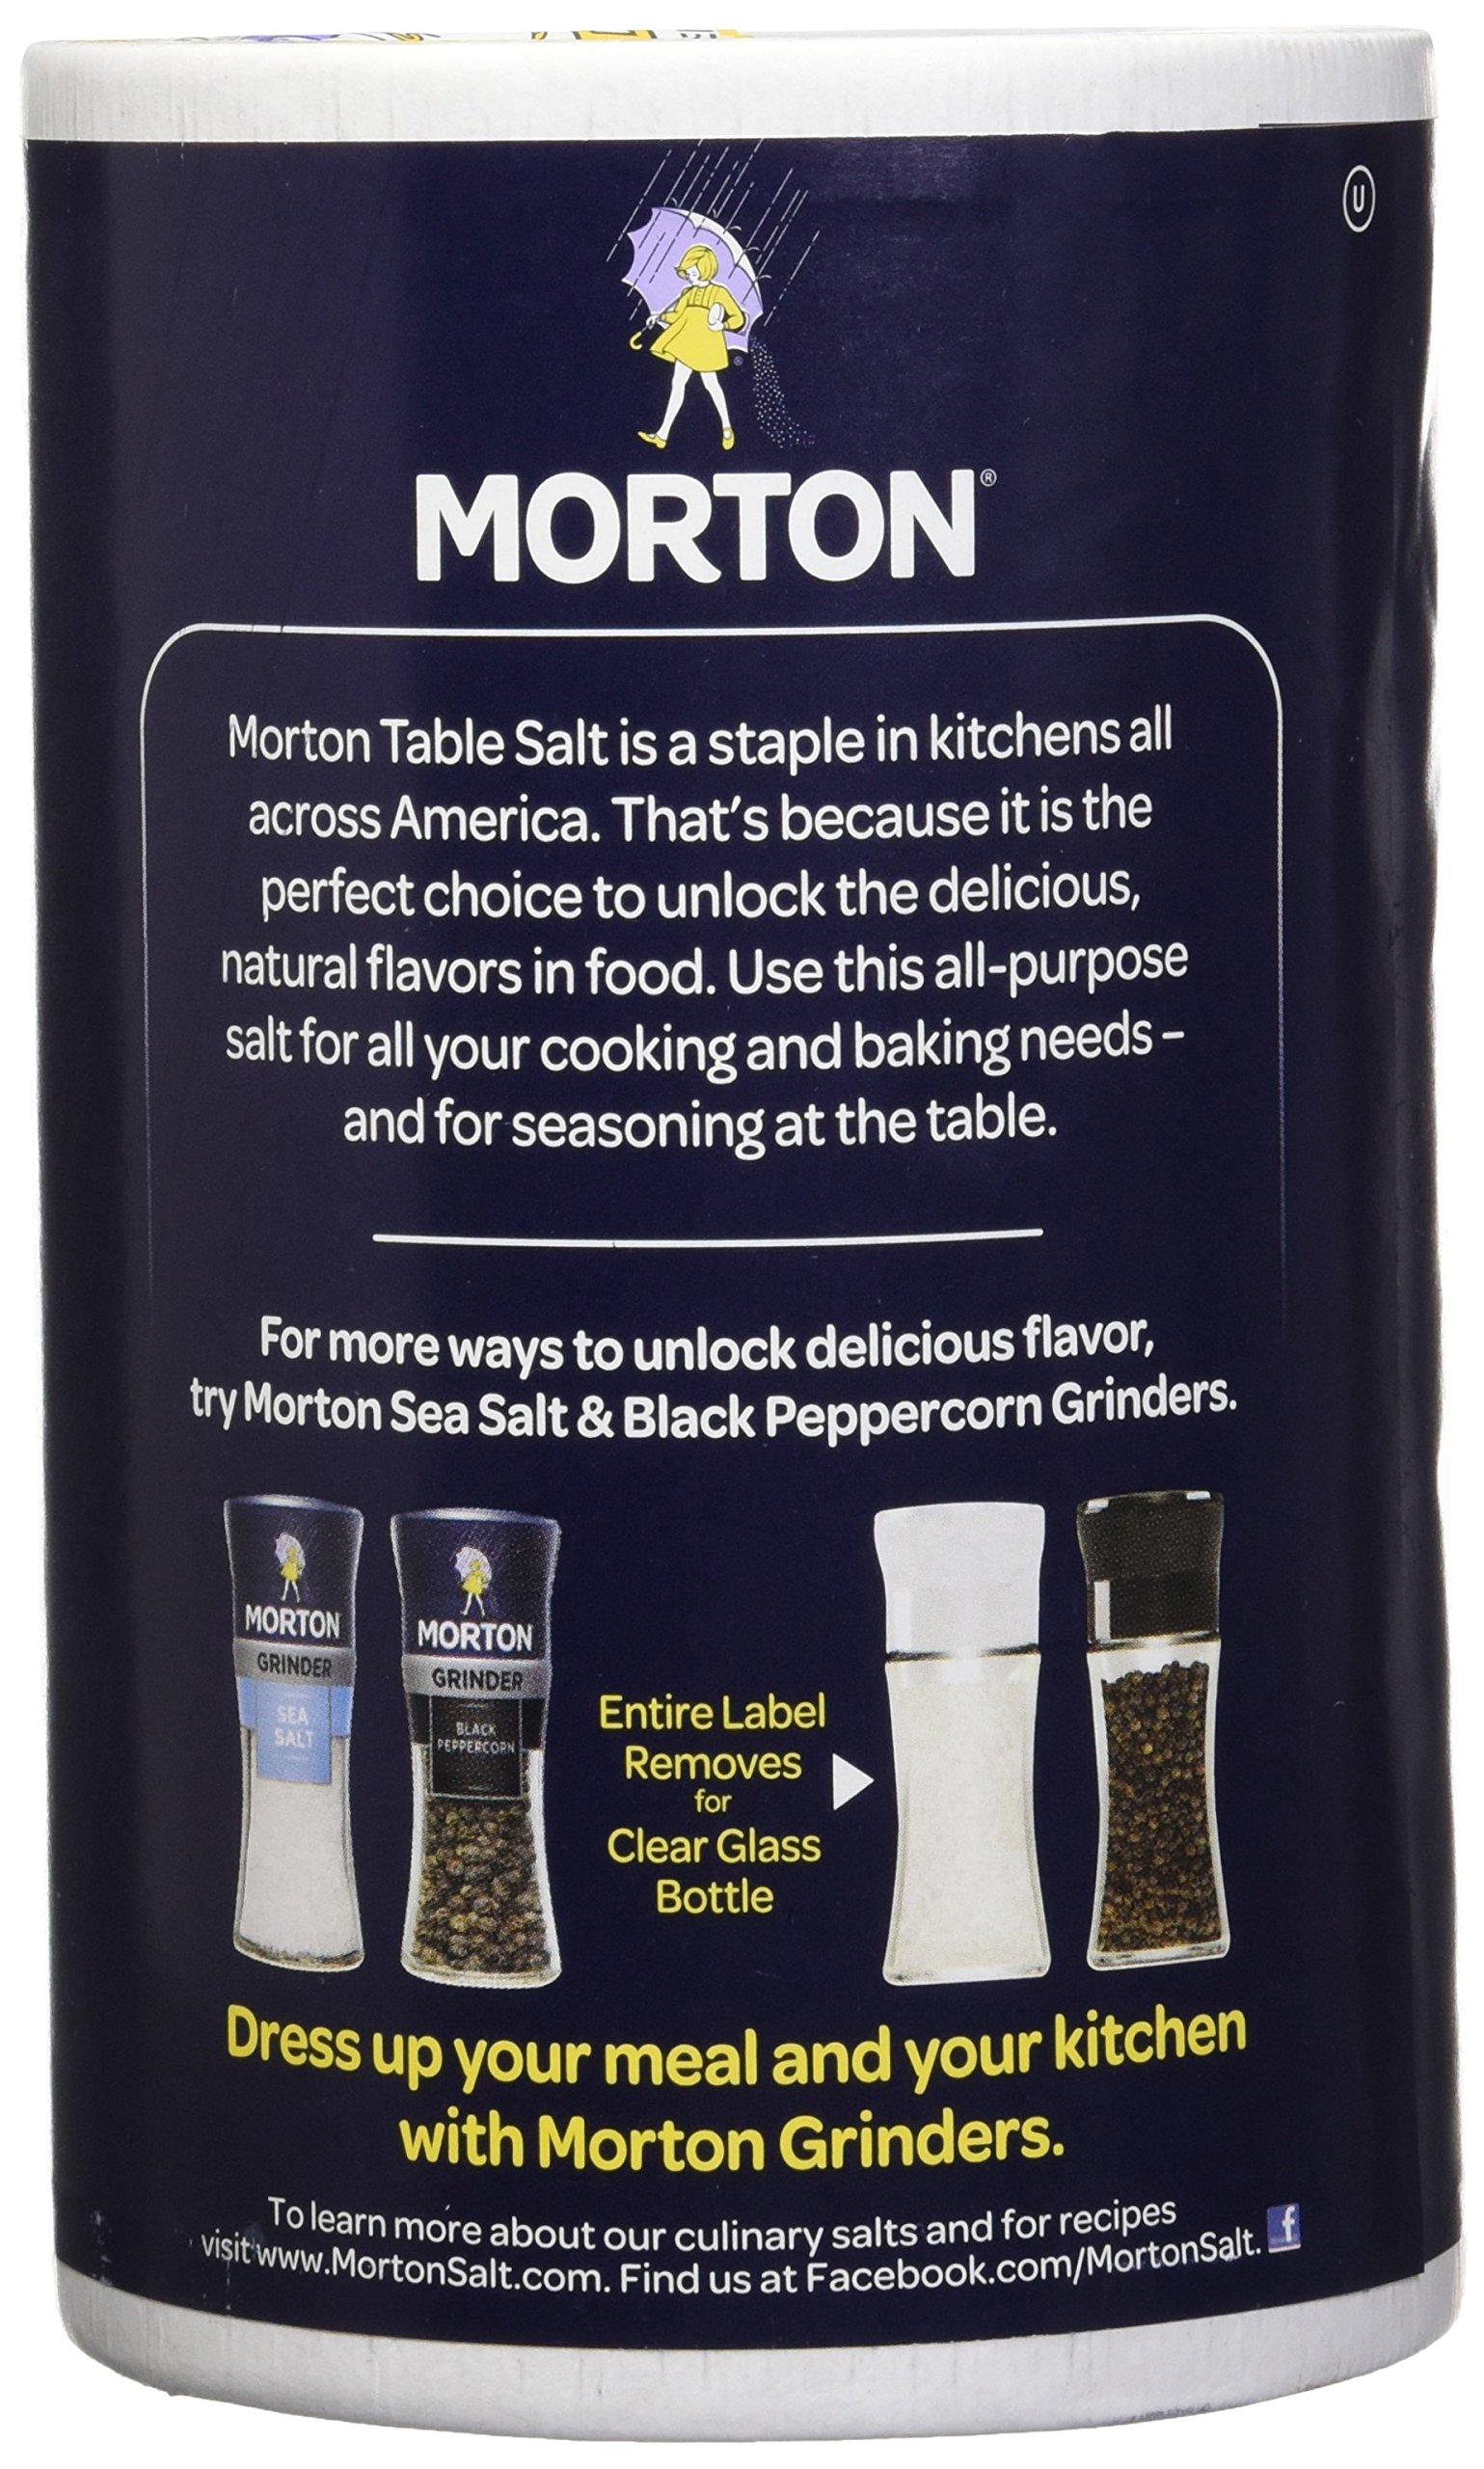 Morton Iodized Salt, 26 oz, Pack of 2 by Morton (Image #3)